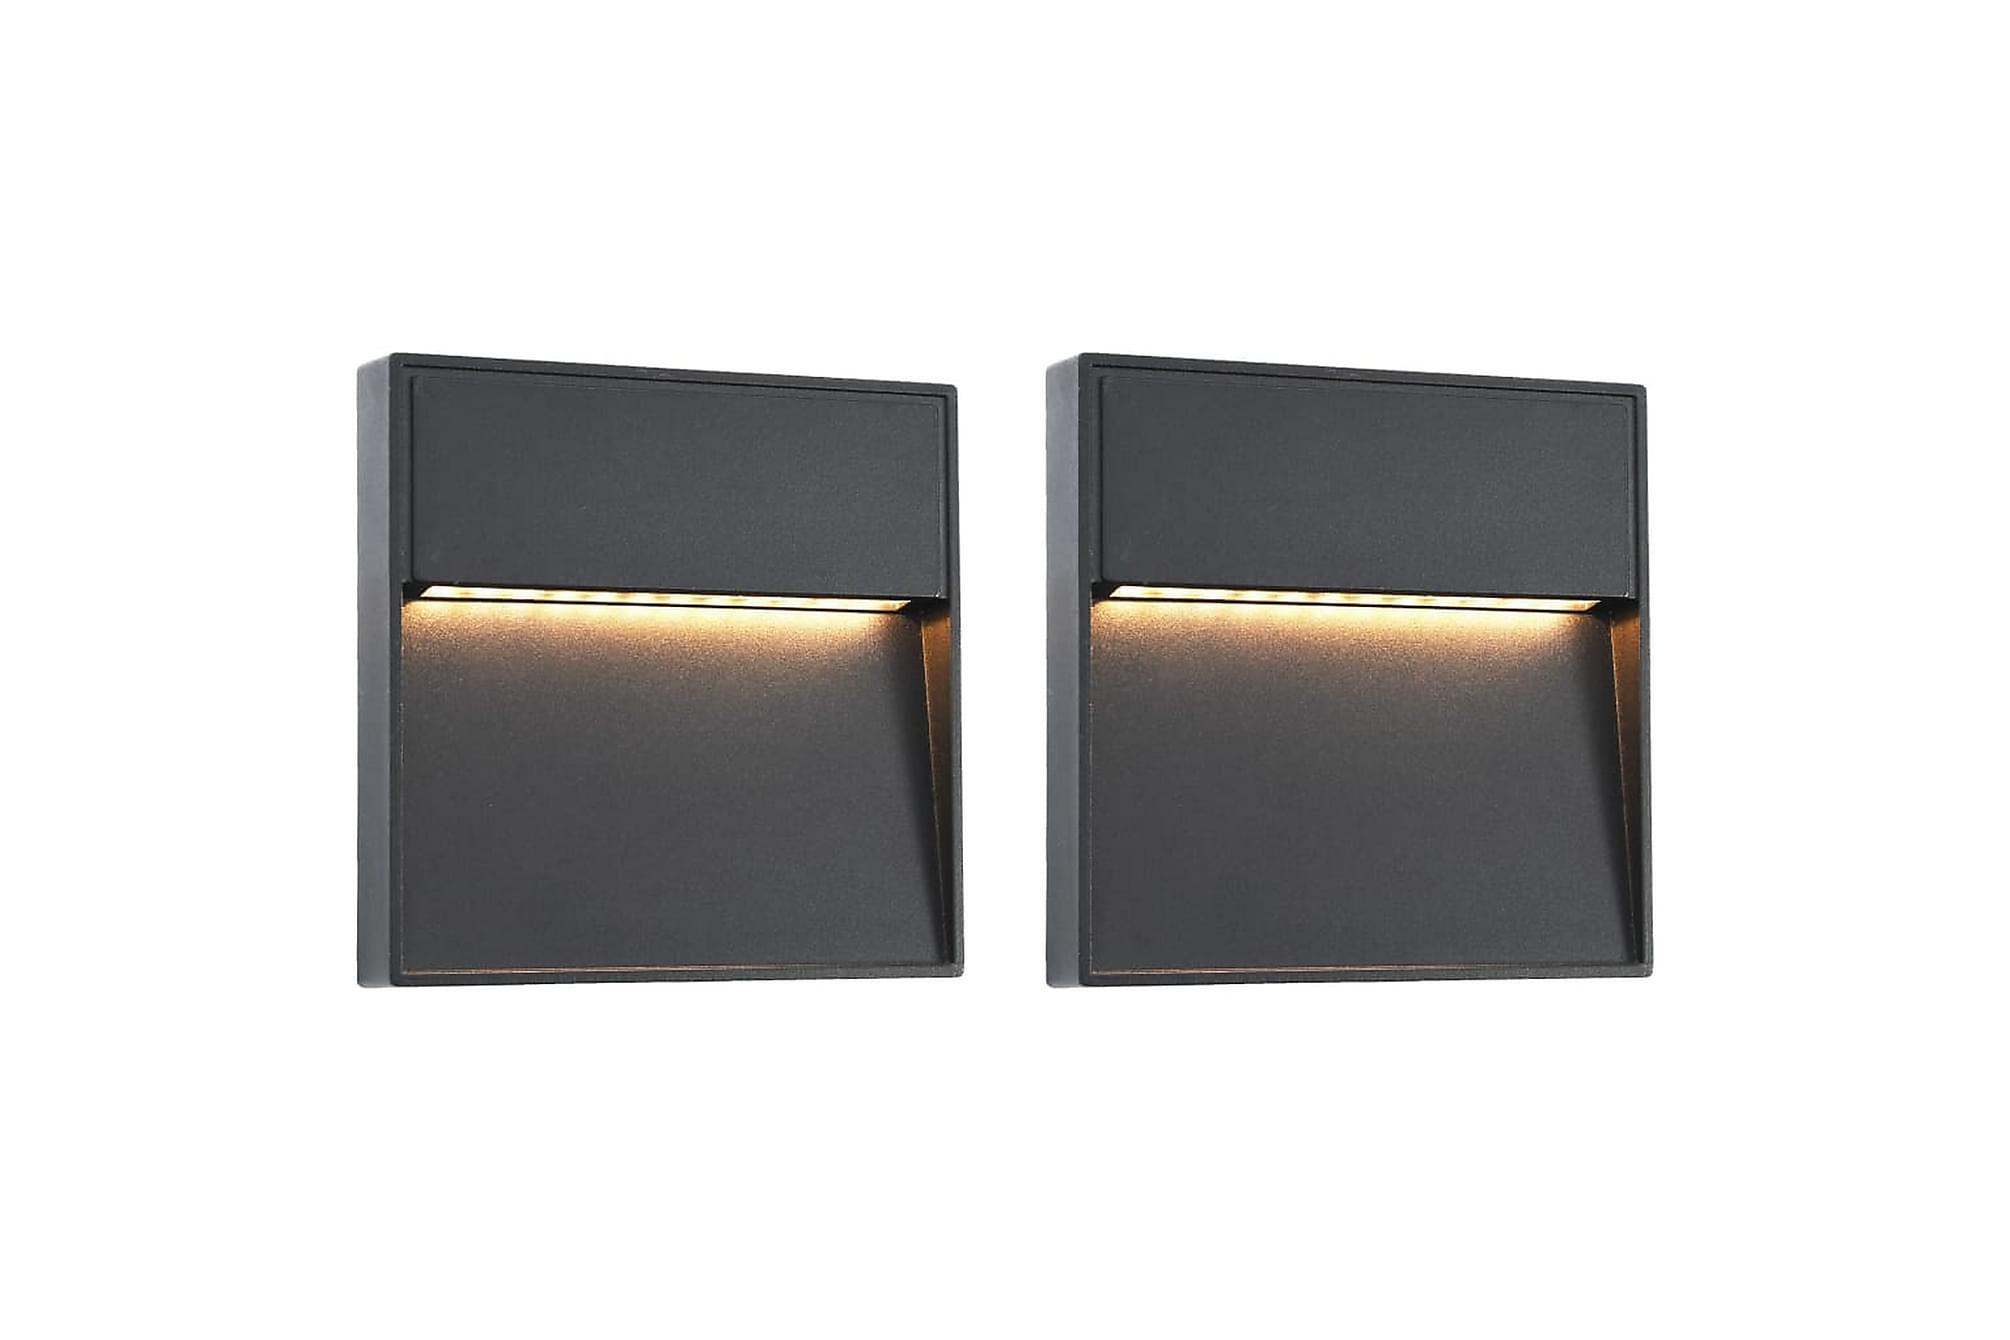 Utomhusvägglampa LED 2 st 3 W svart fyrkantig